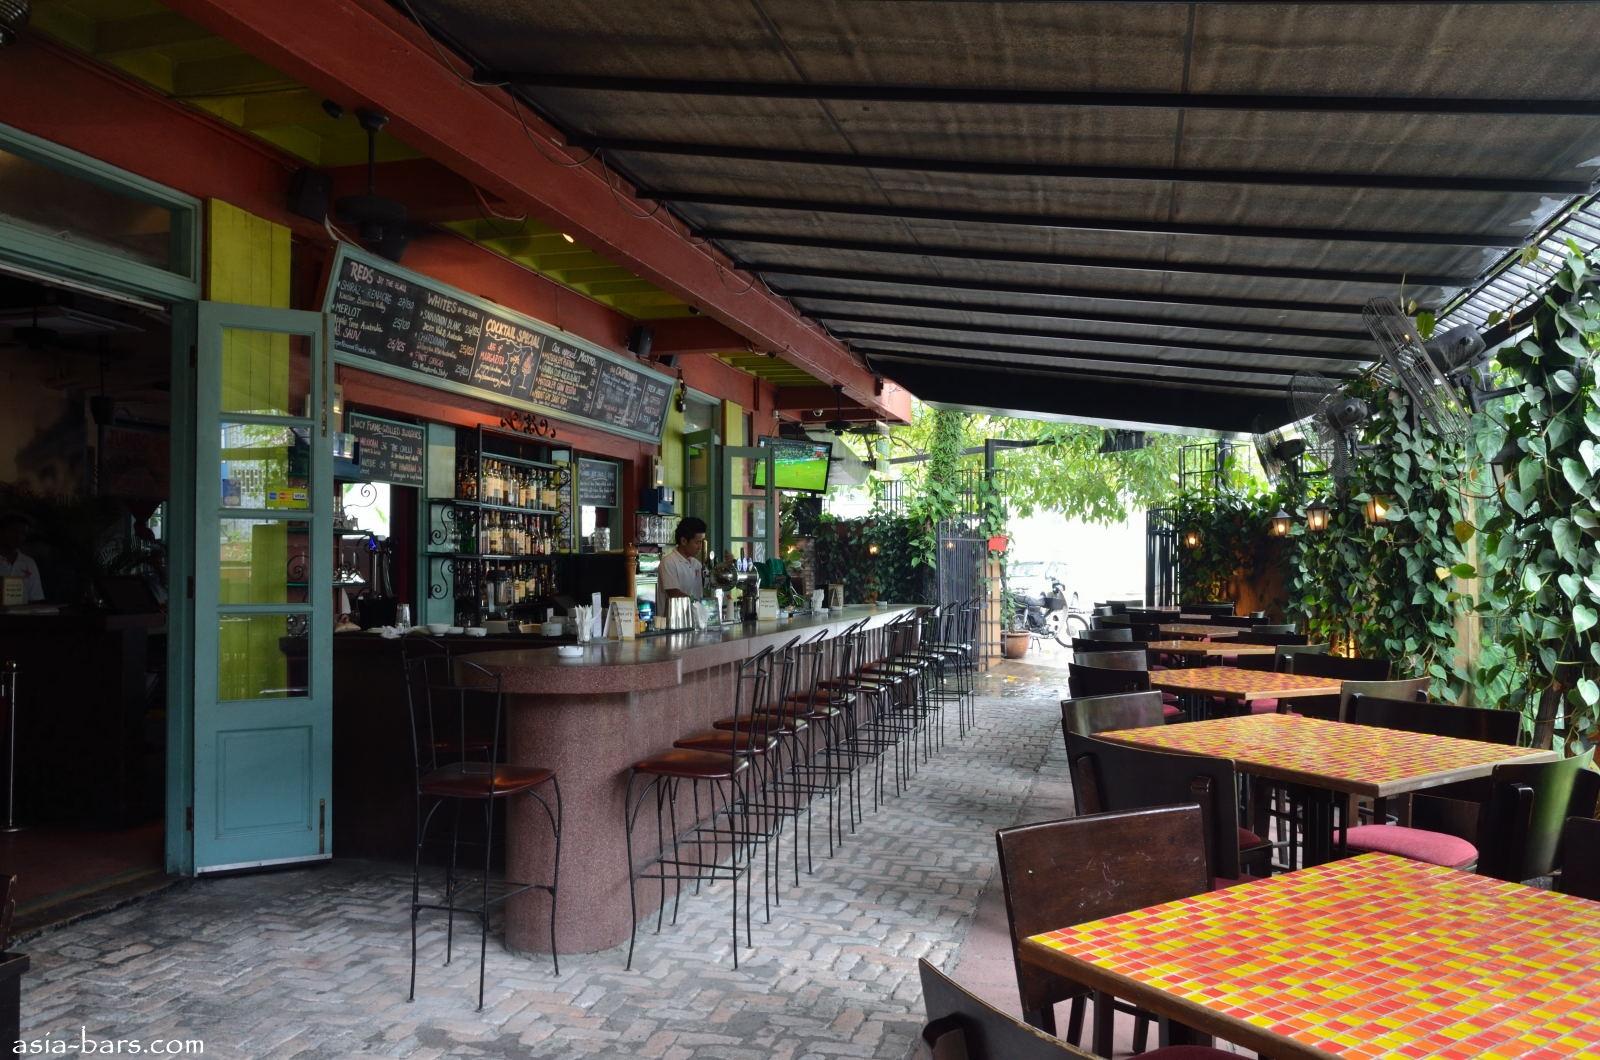 Patio bar Outdoor bars and Havana on Pinterest